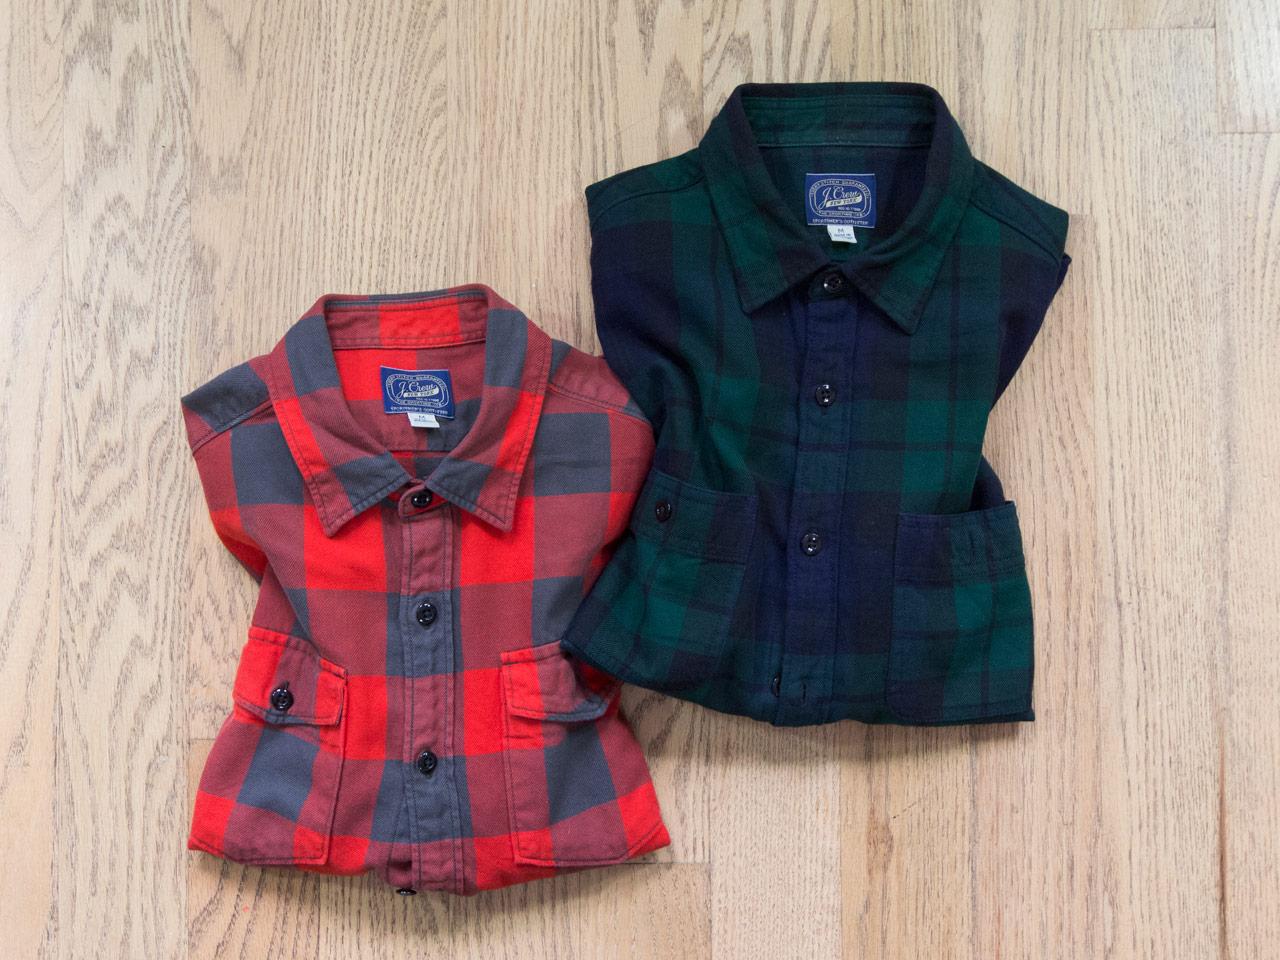 effortless essentials minimalist wardrobe - plaid flannel shirts